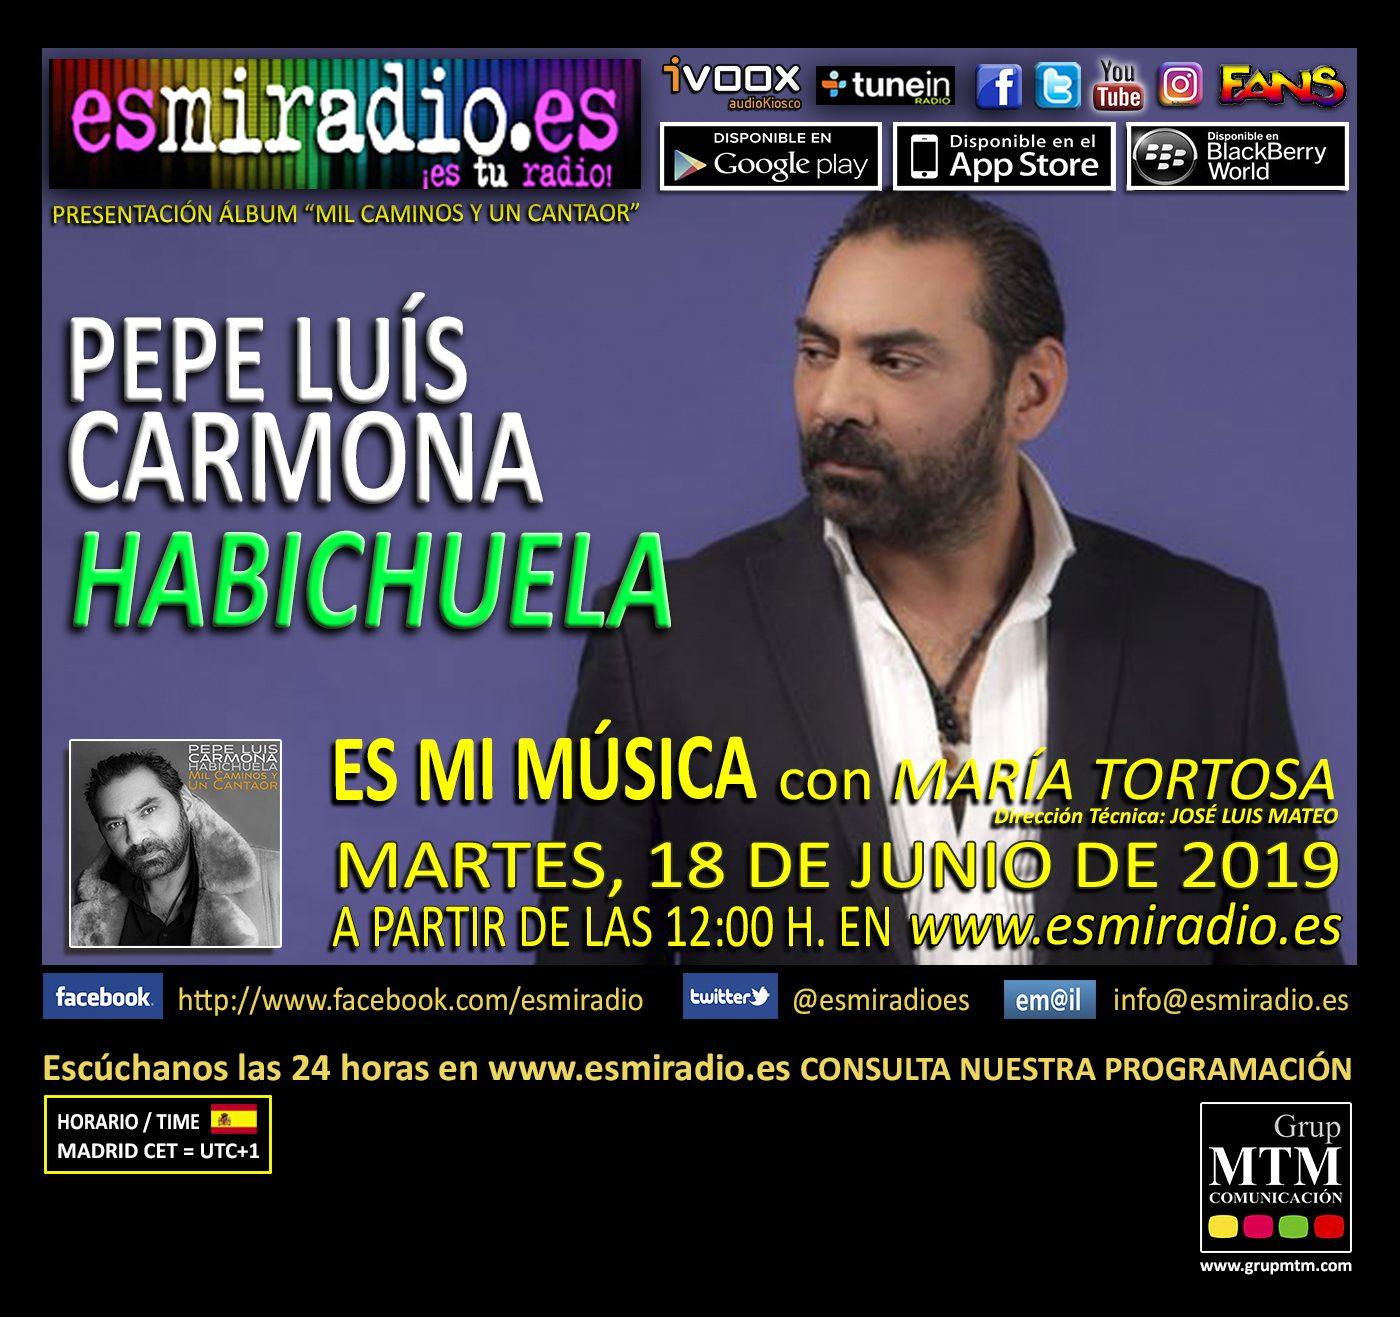 Pepe Luis Carmona Habichuela esmiradio